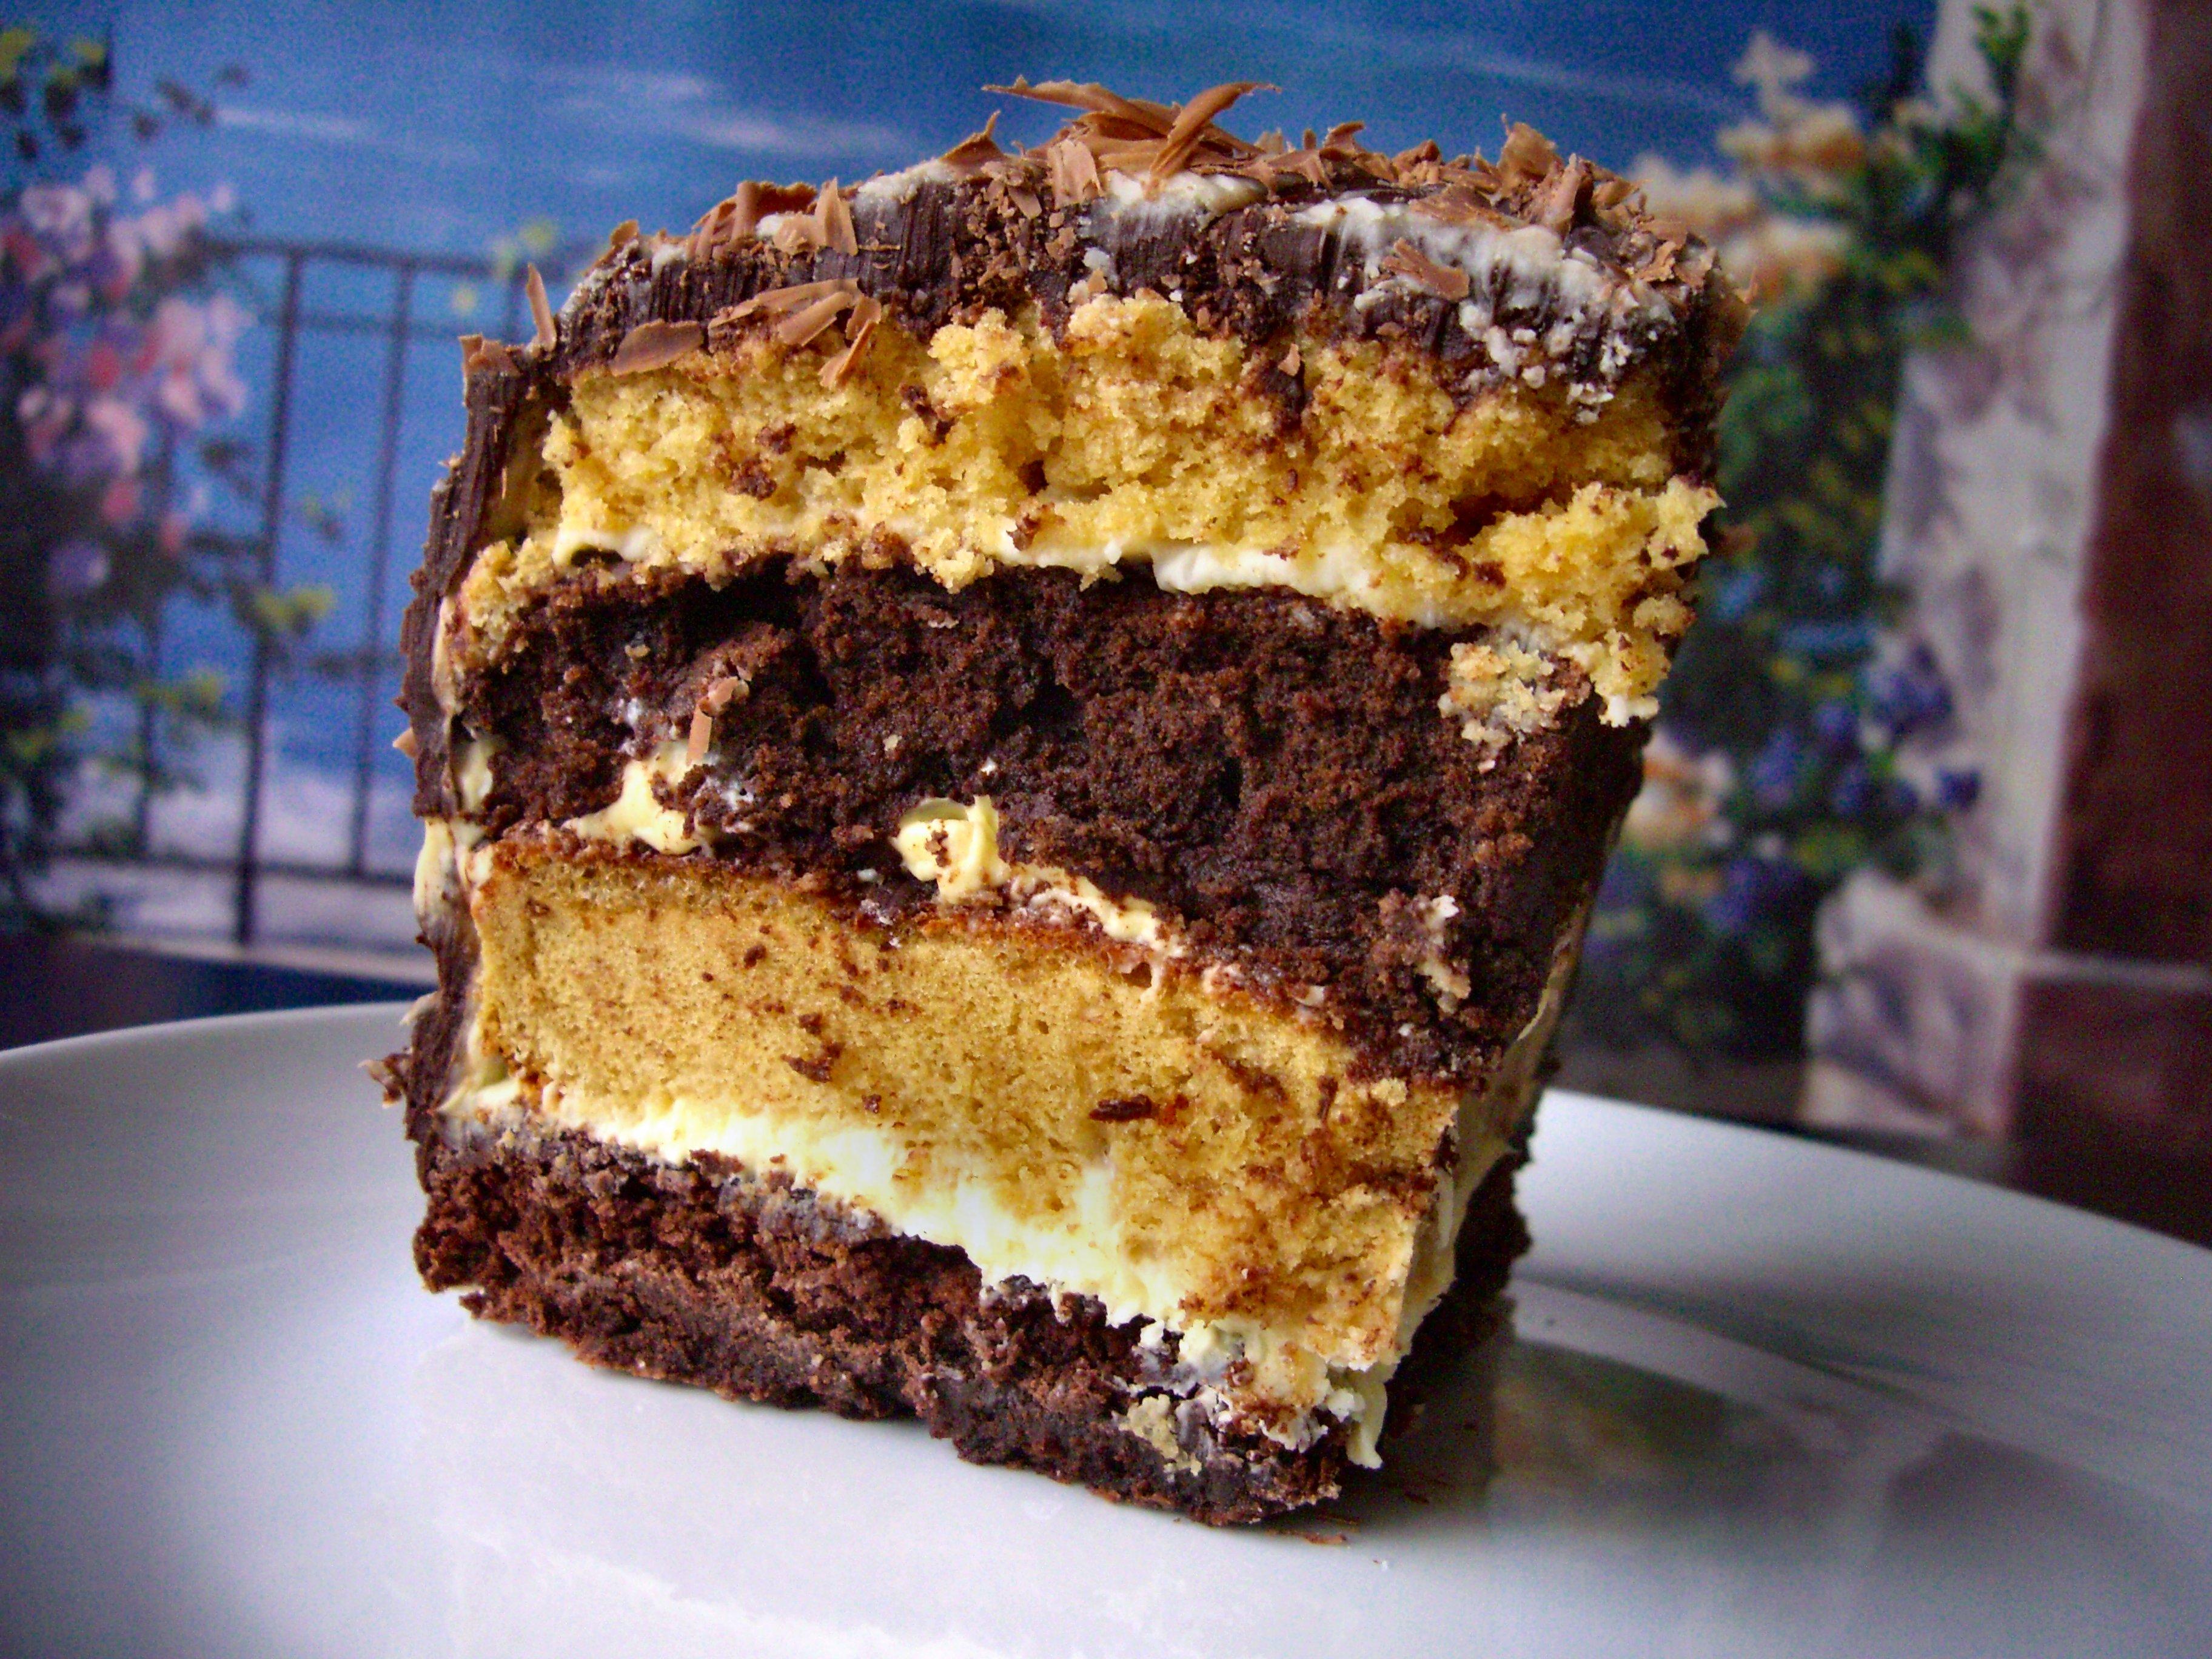 Tuxedo Layer Cake Brownie Chocolates and Vanilla fruipp